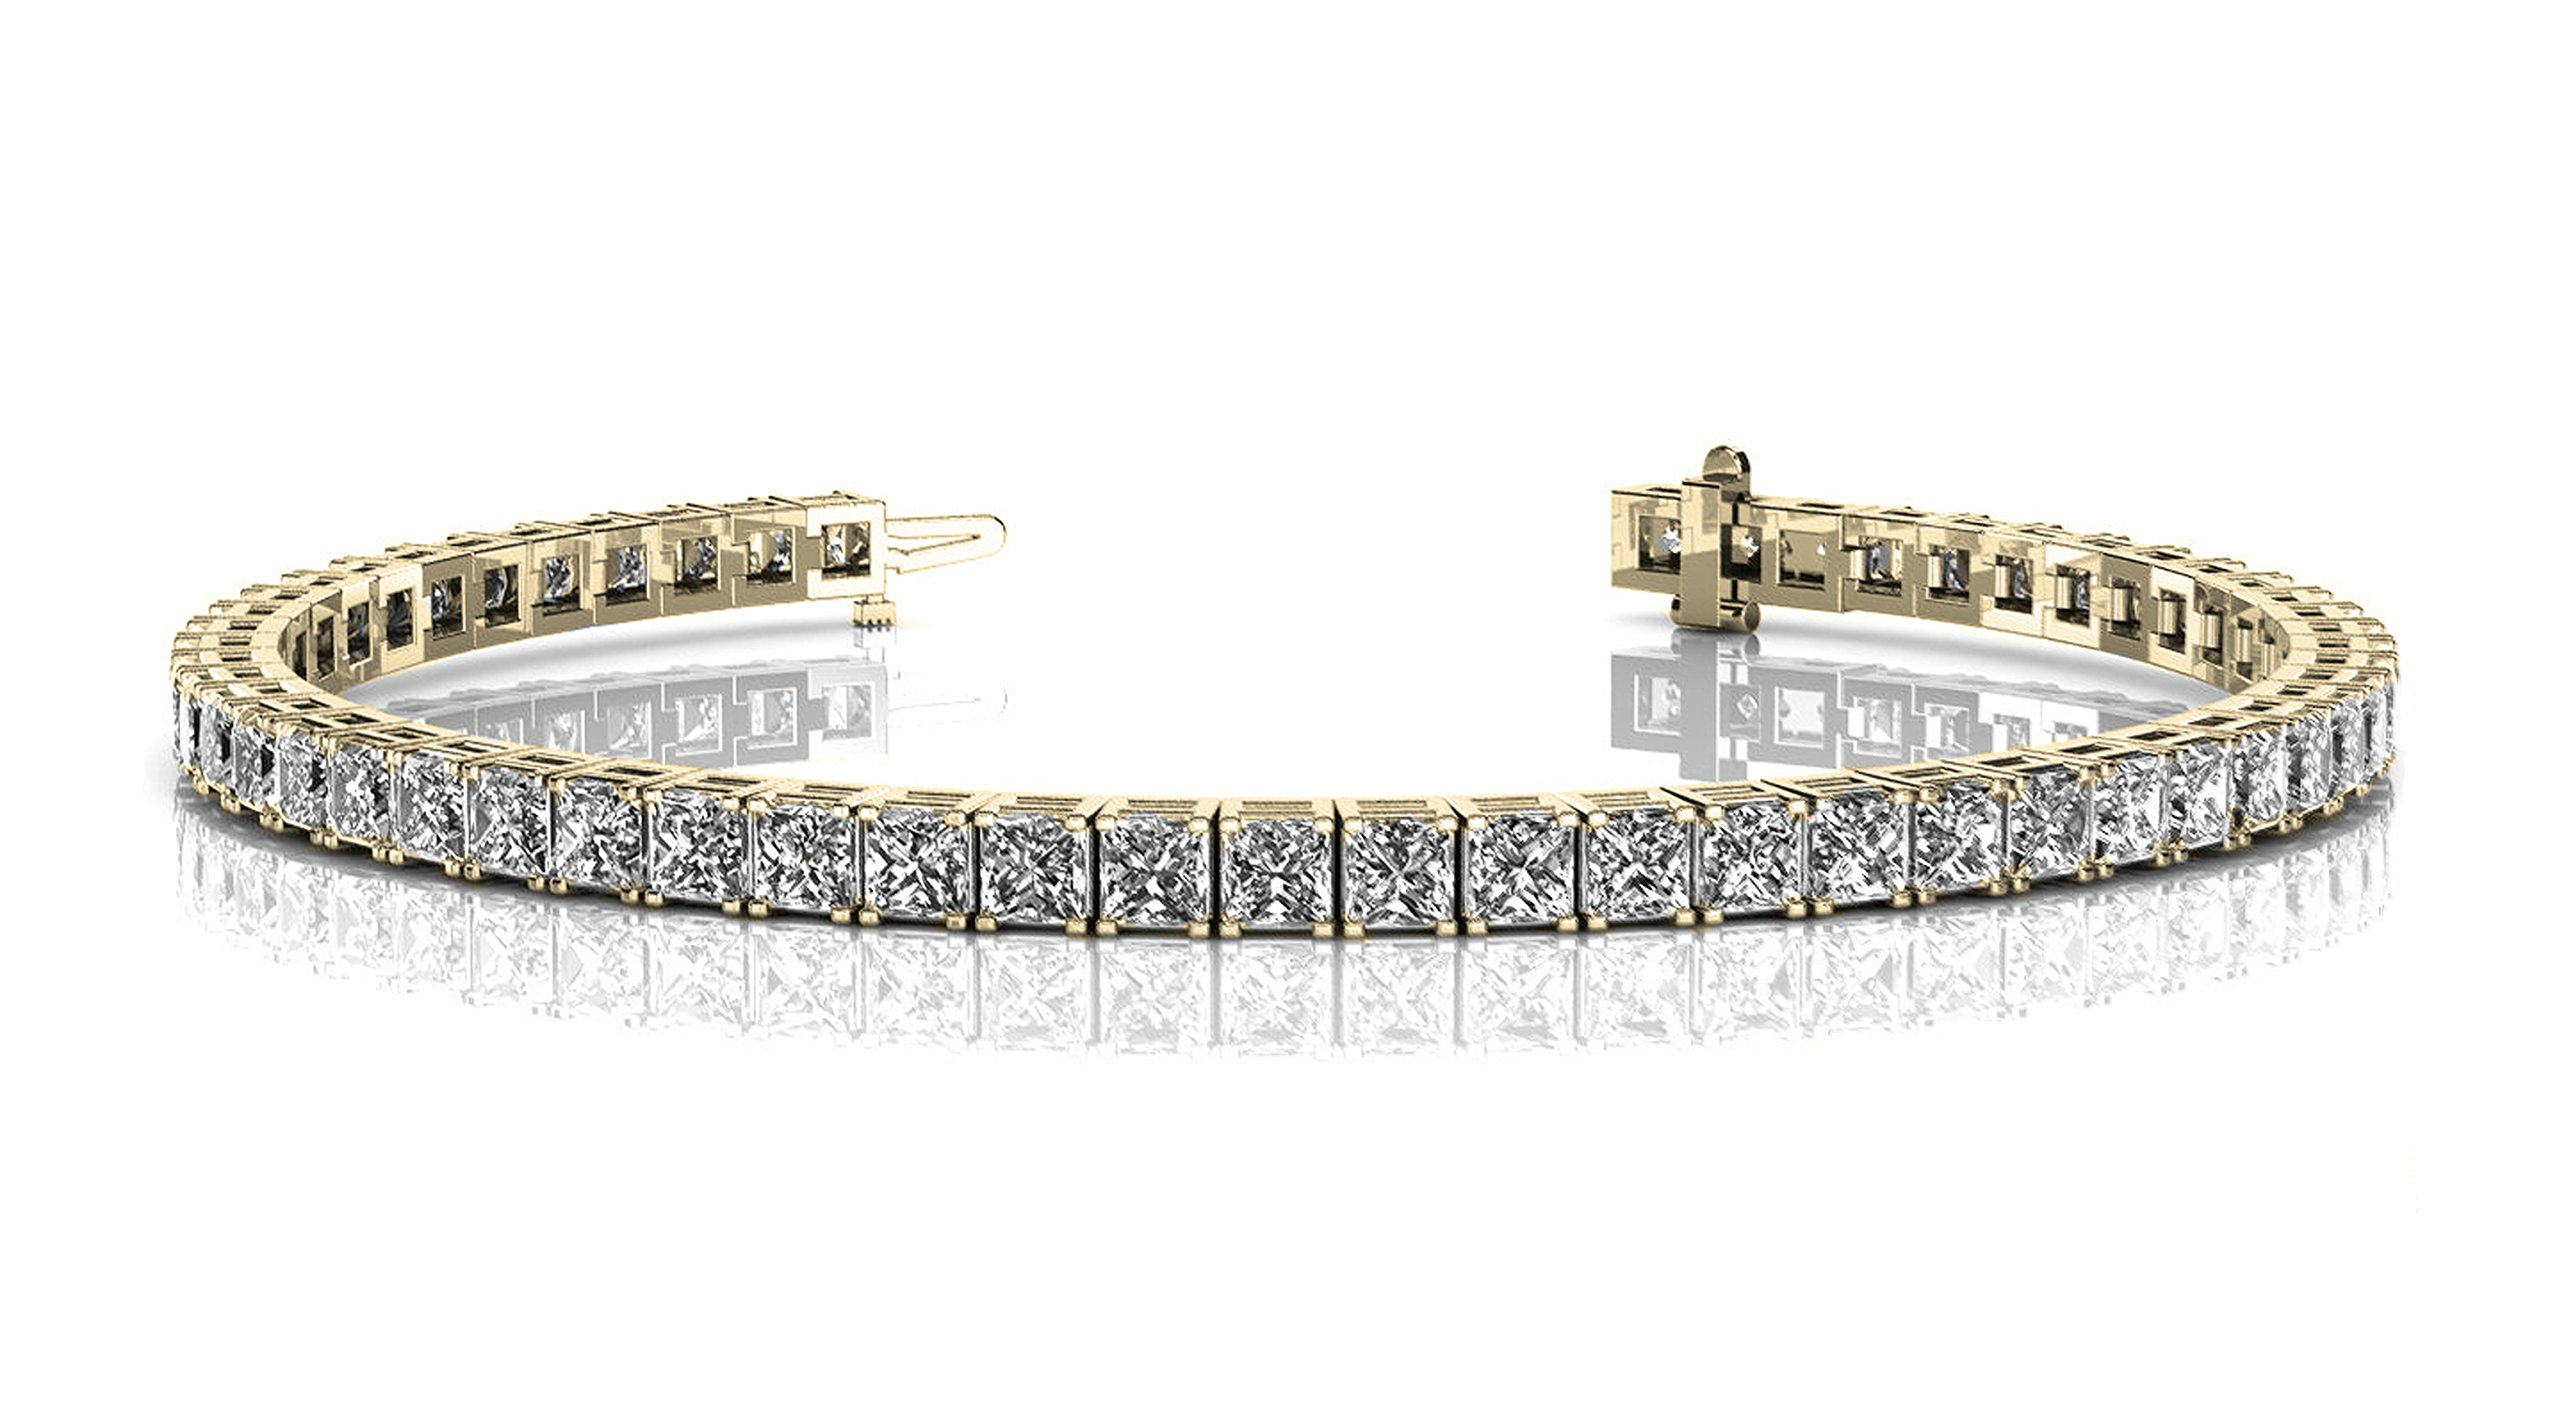 Cate & Chloe Leila 18k Tennis Bracelet, Women's 18k Yellow Gold Plated Tennis Bracelet w/Cubic Zirconia Square Crystals, 7.5'' Sparkling Stone Bracelet for Women, CZ Wrist Bracelets